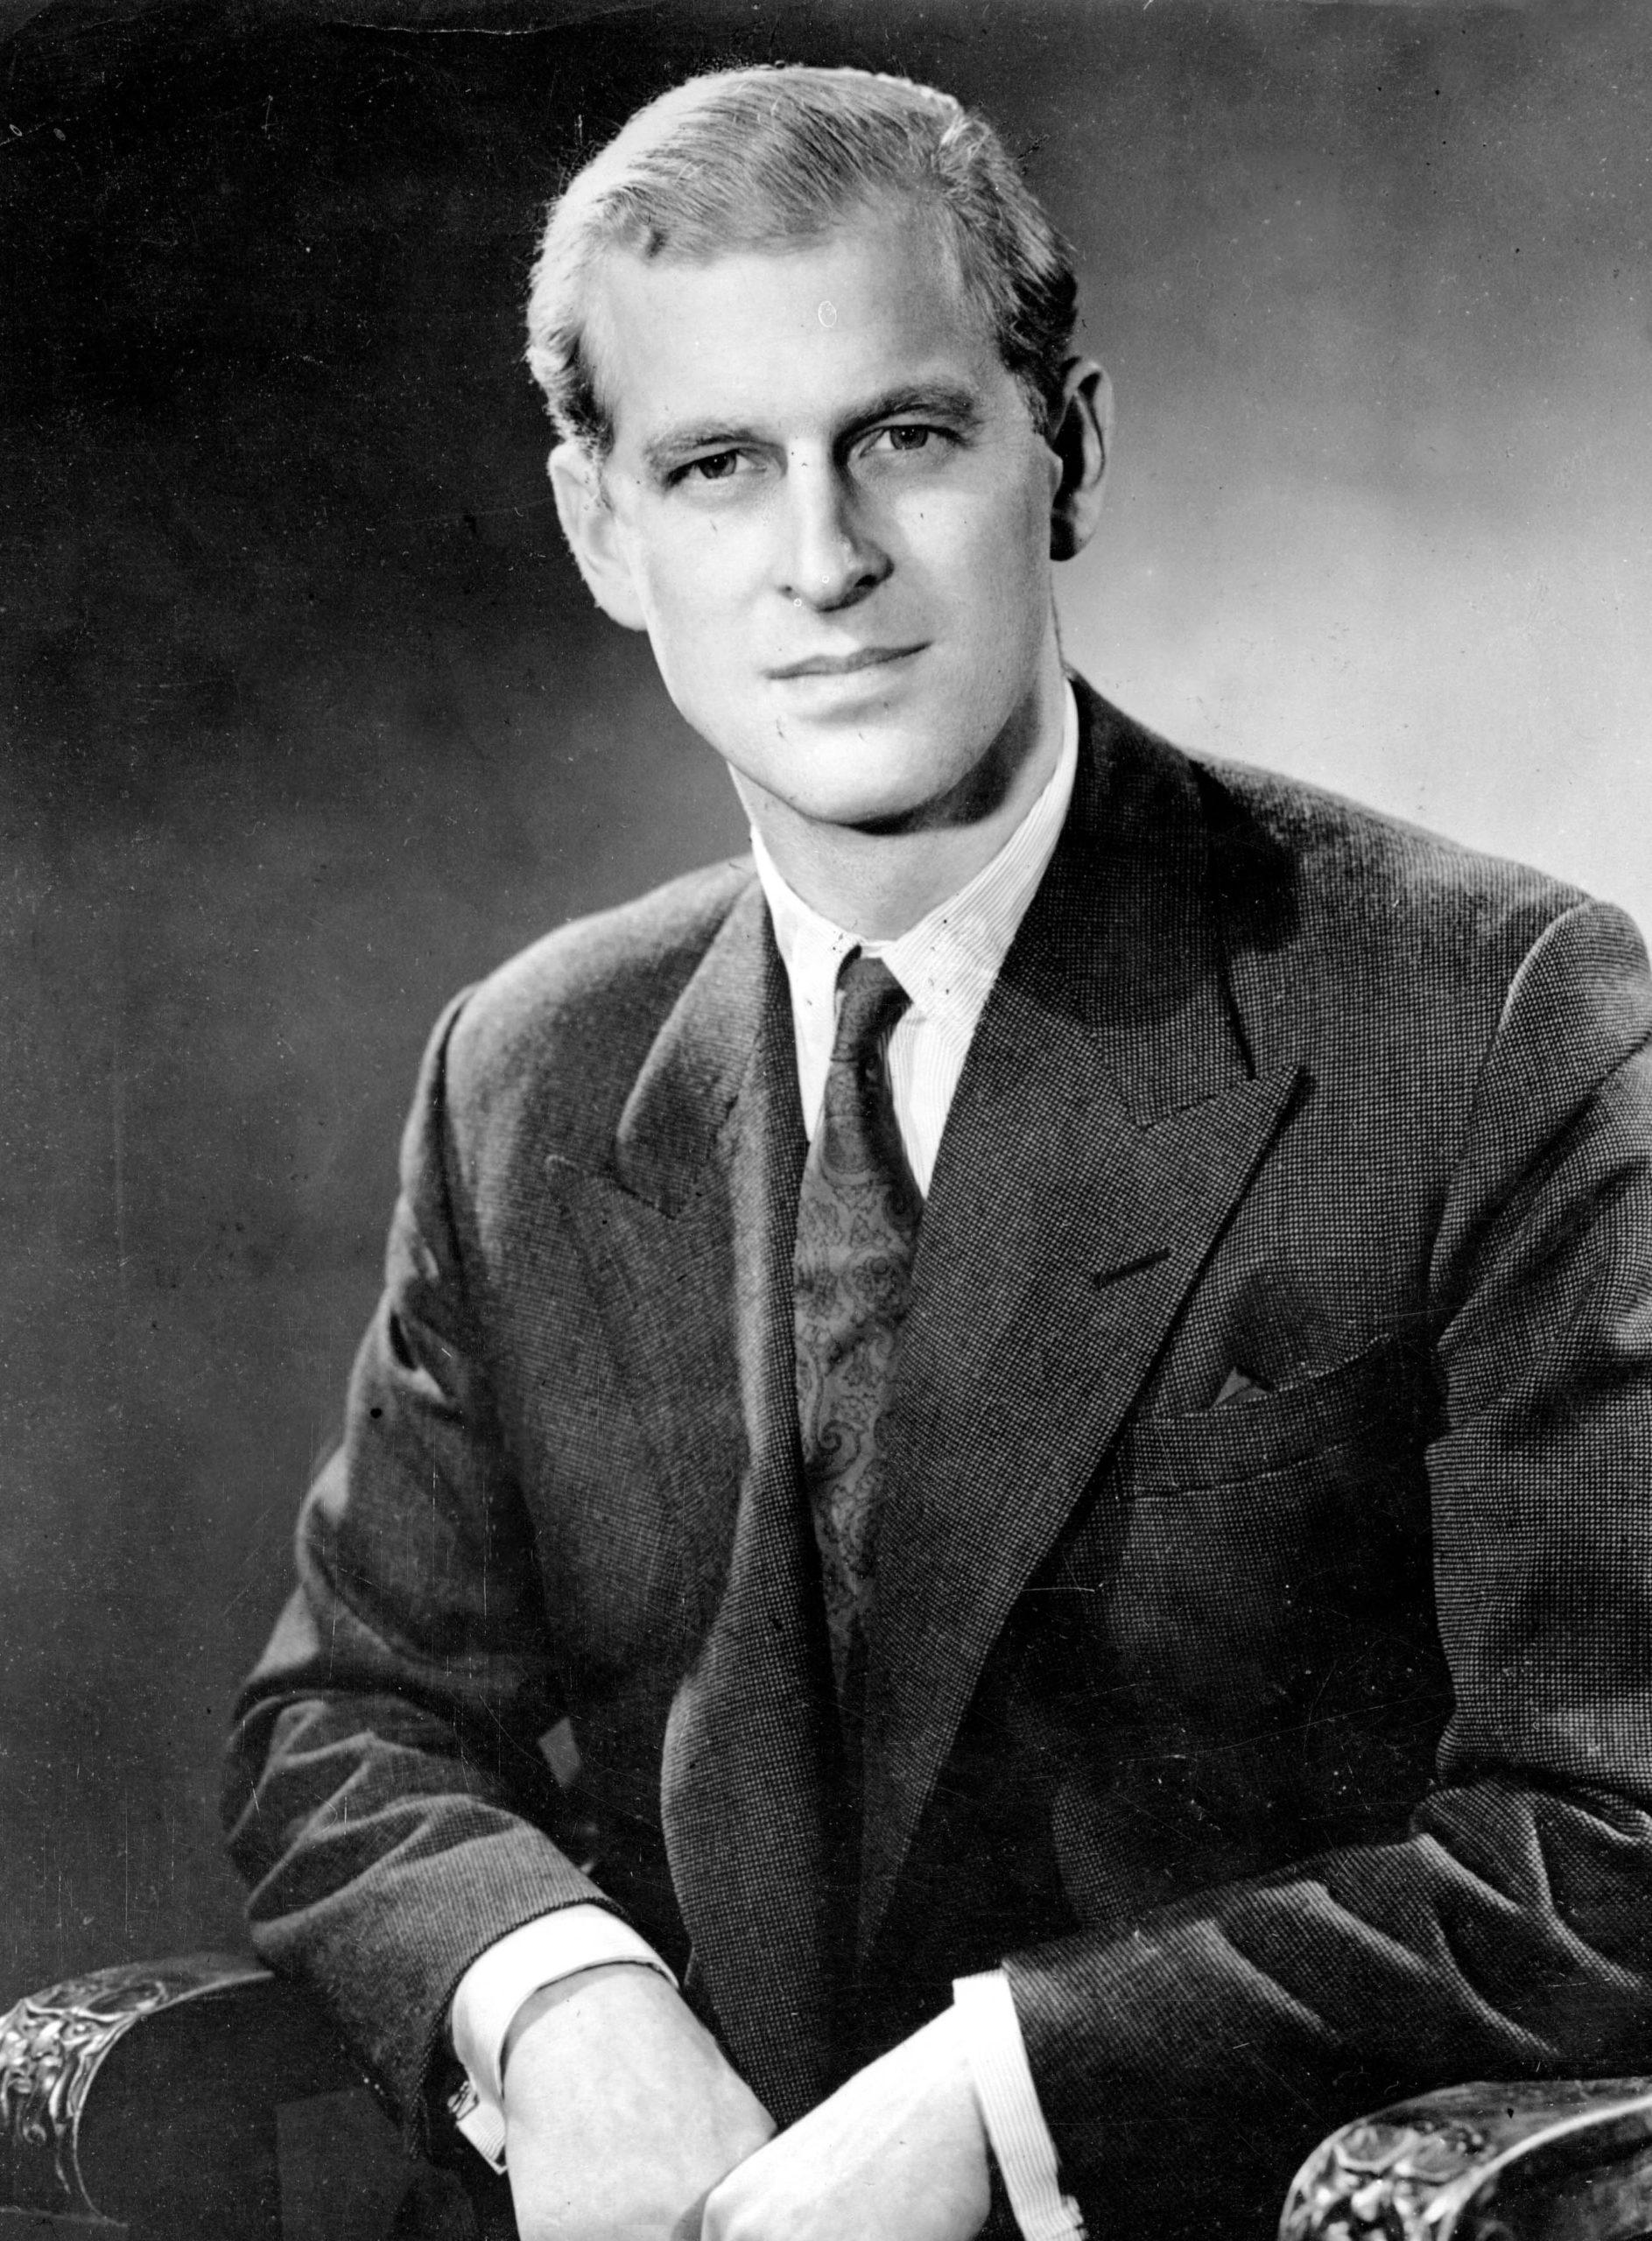 Portrait Of Prince Philip, November 1947